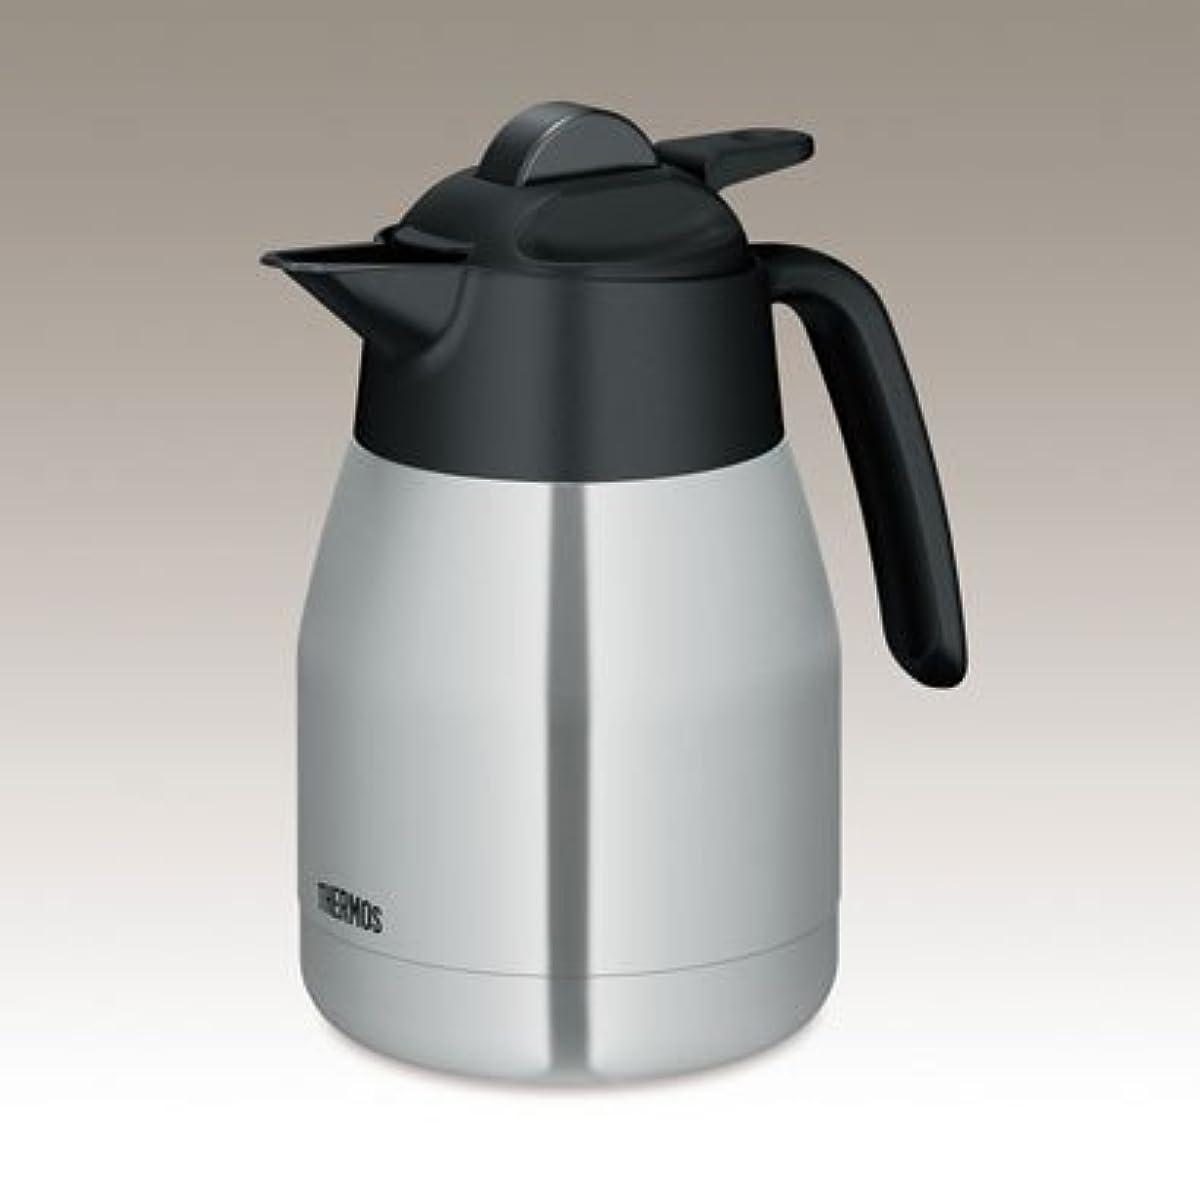 THERMOS 커피 메이커 ECH-1000 용진공 단열 포트(중 선 부착) B-004627-